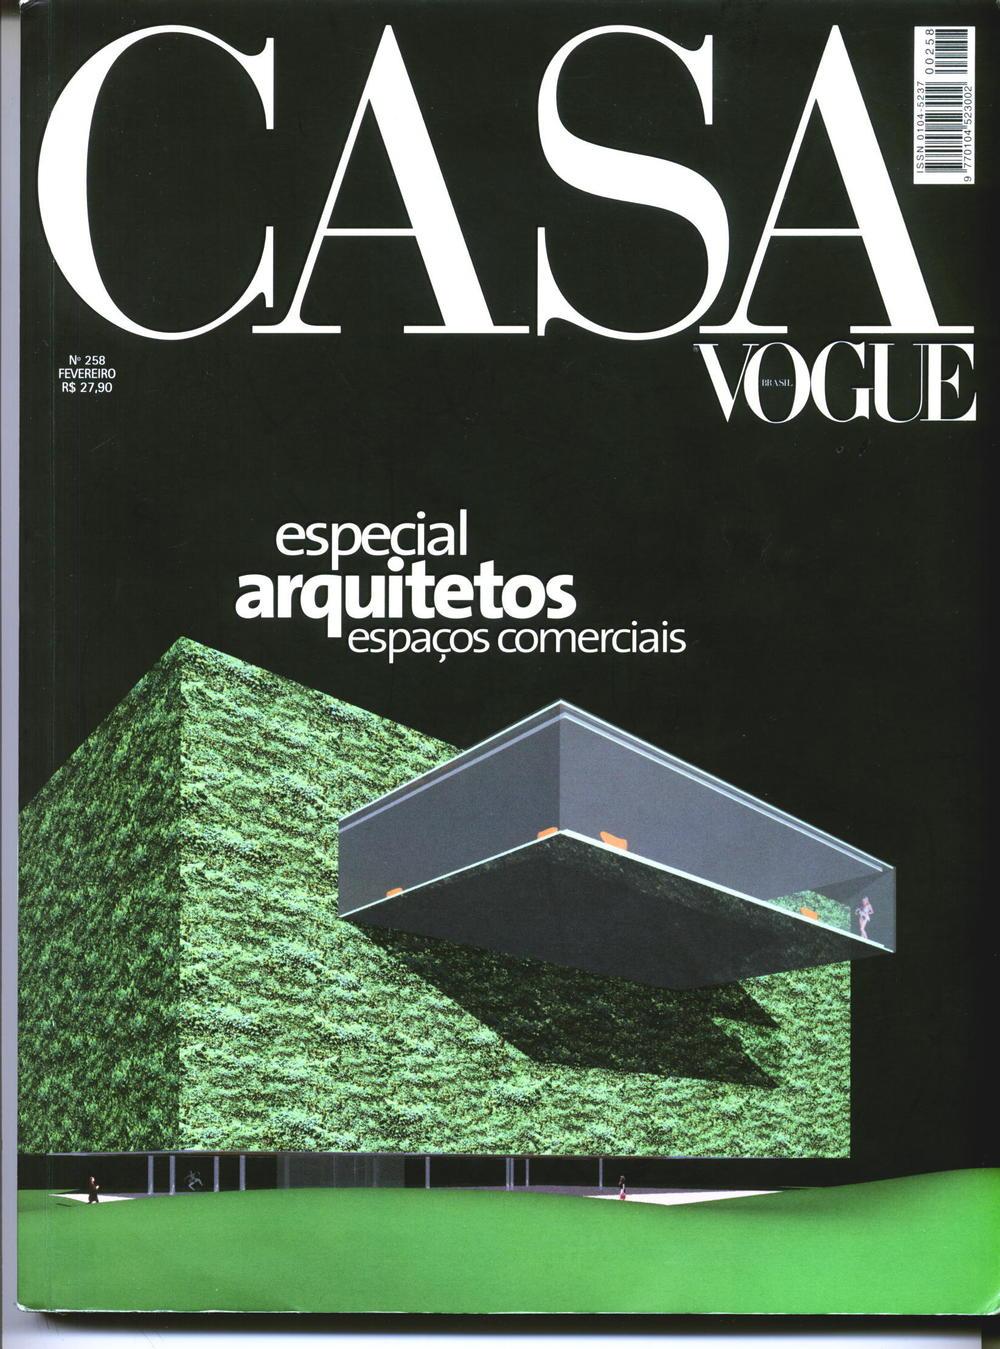 Casa Vogue capa.jpg